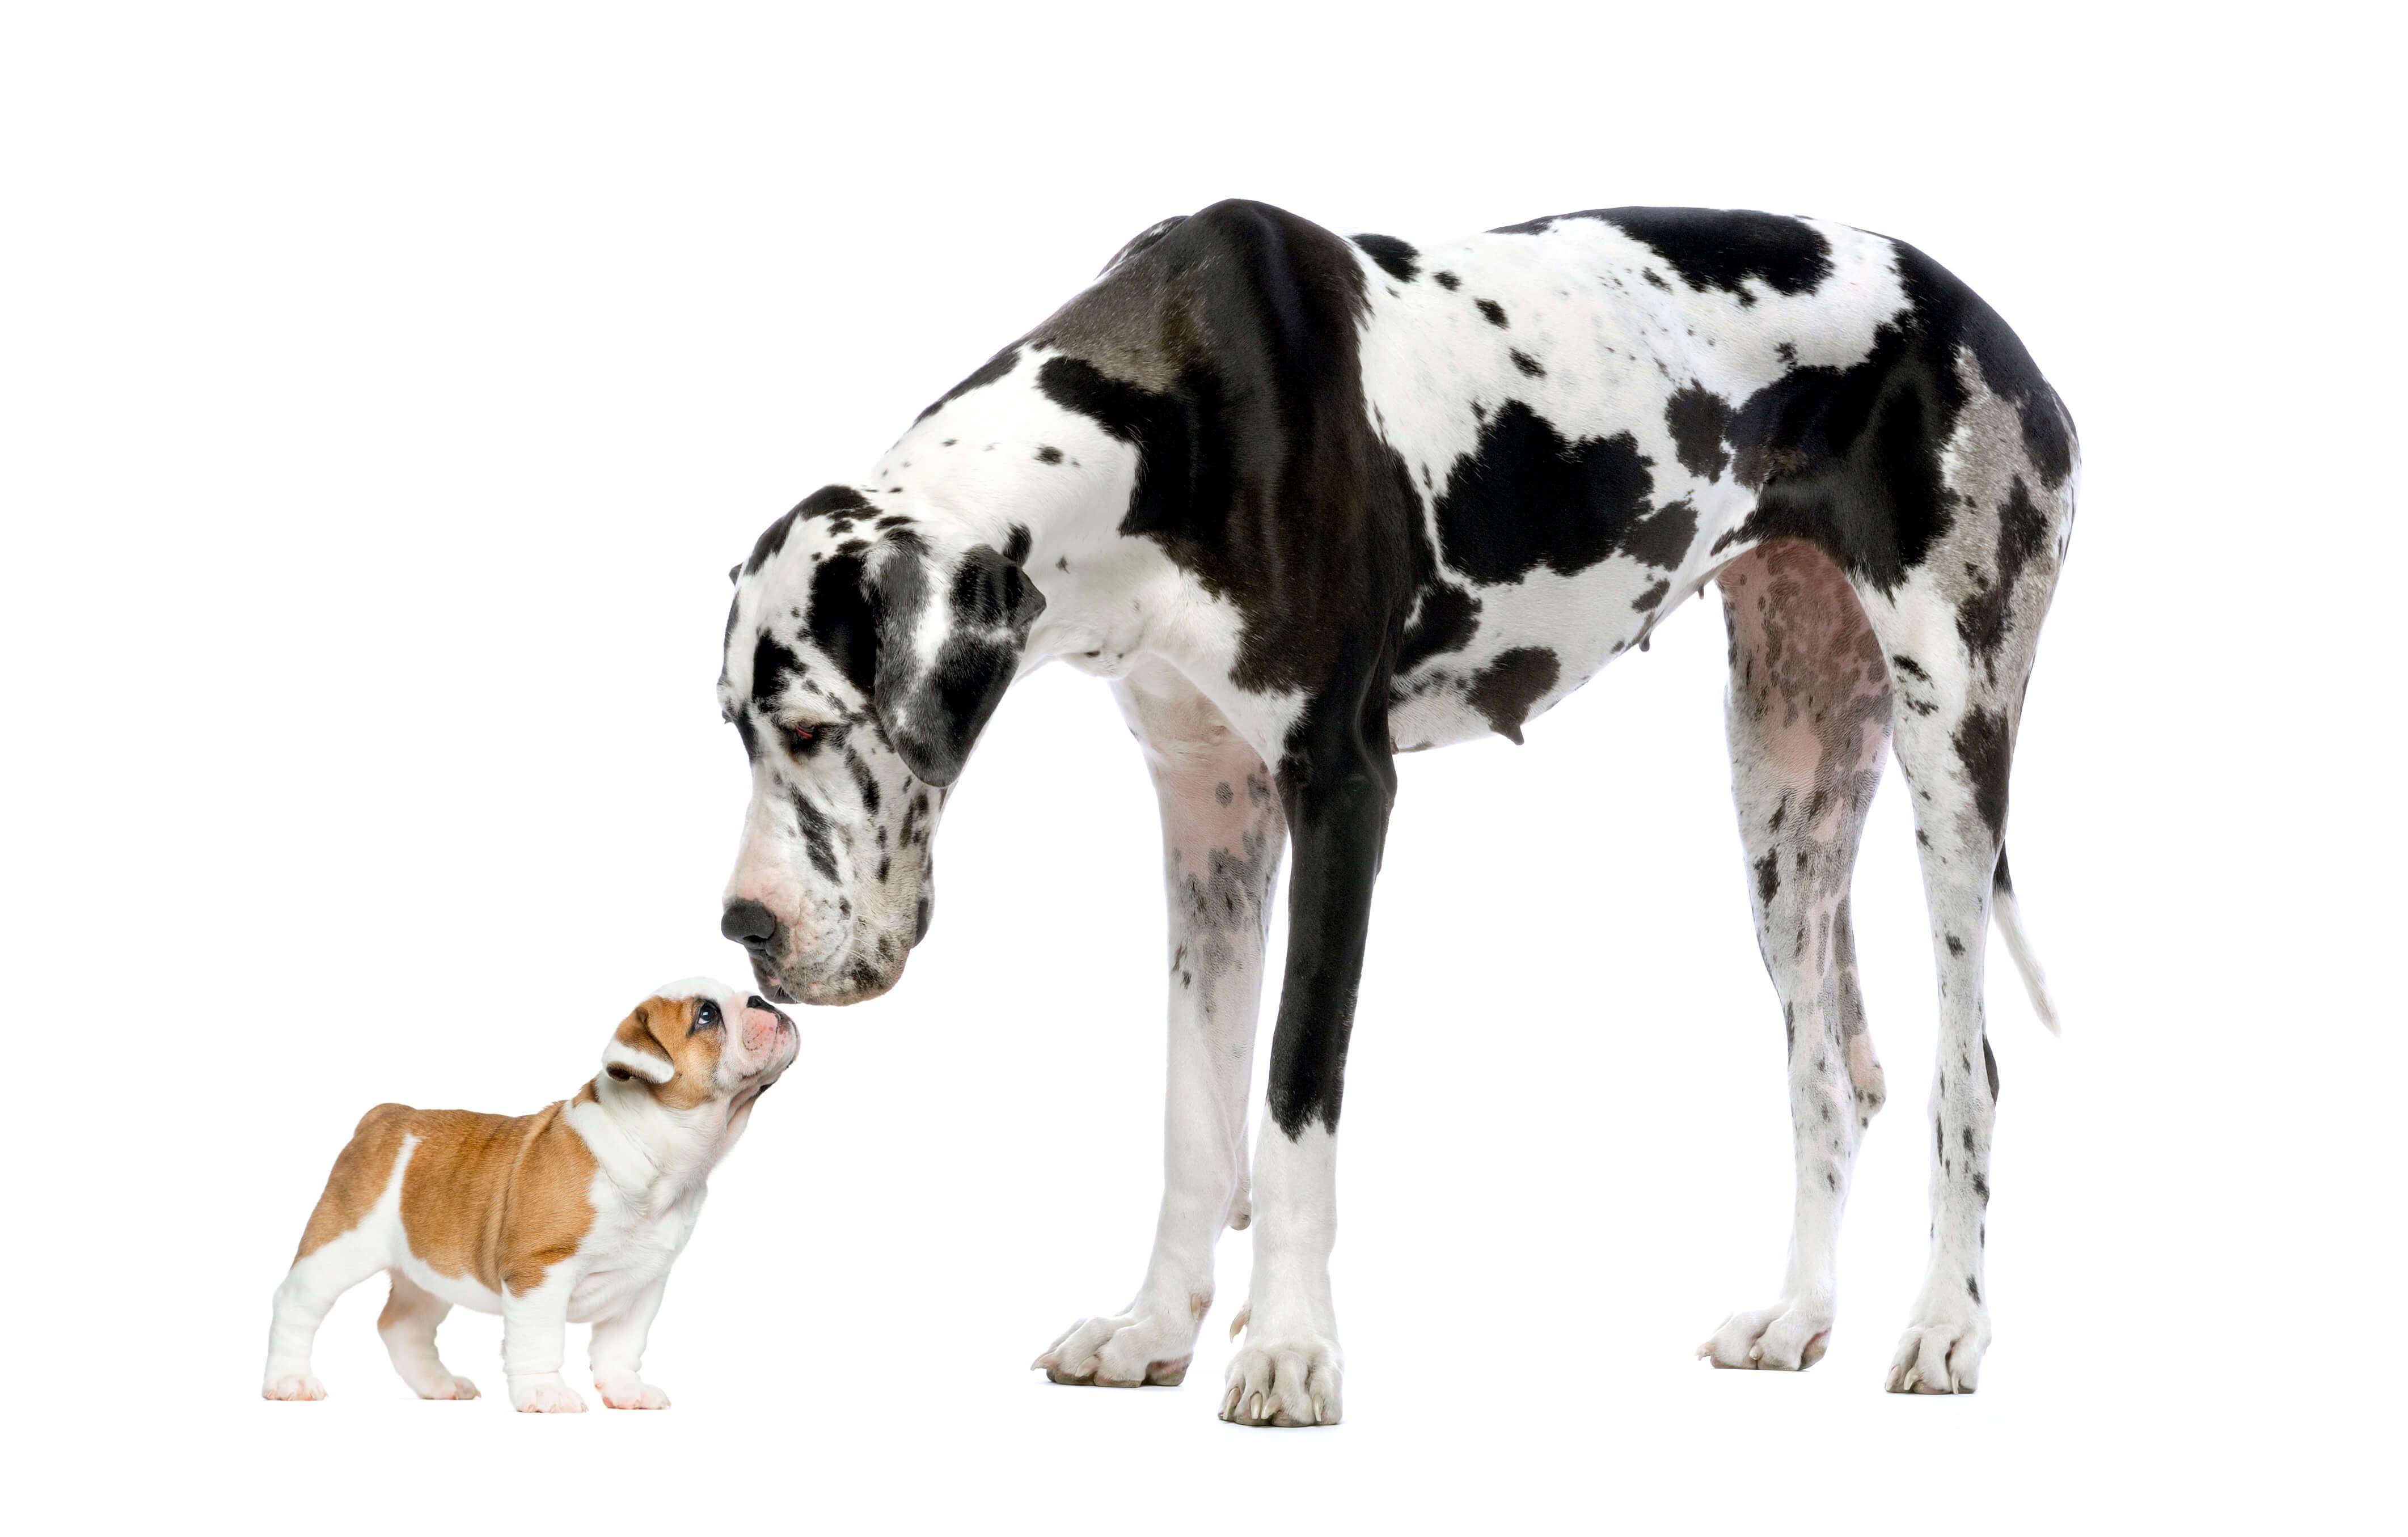 Related Image Great Dane Dog Benefits Big Dog Breeds